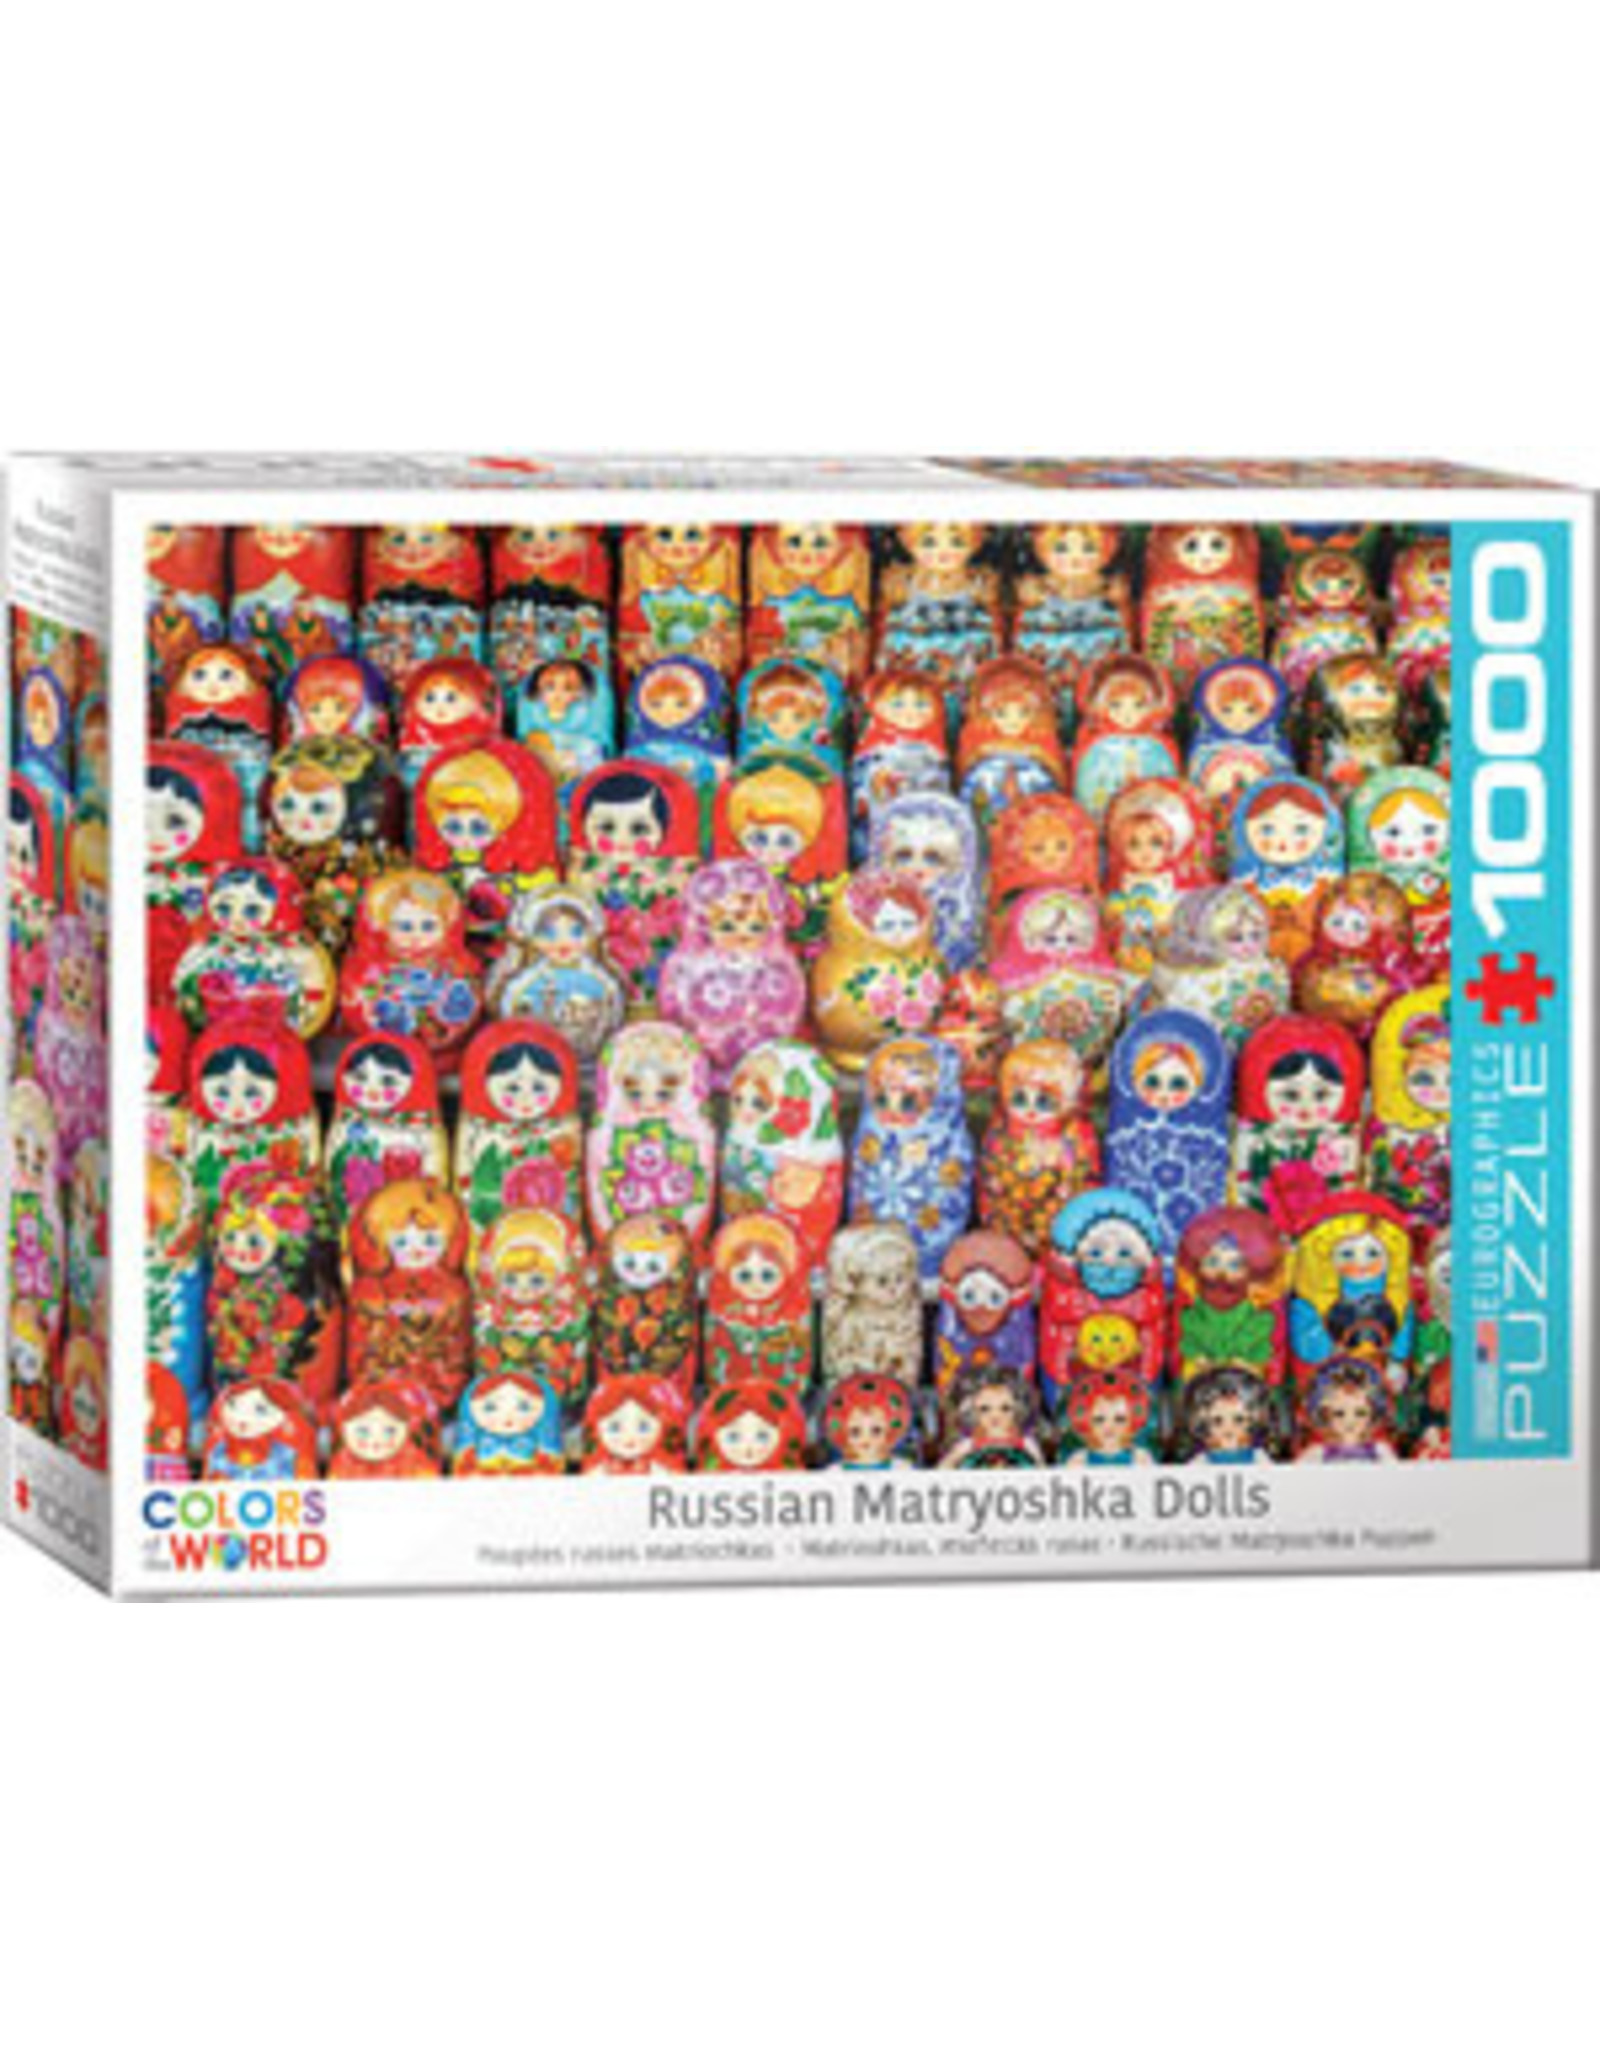 Eurographics Russian Matryoshka Dolls